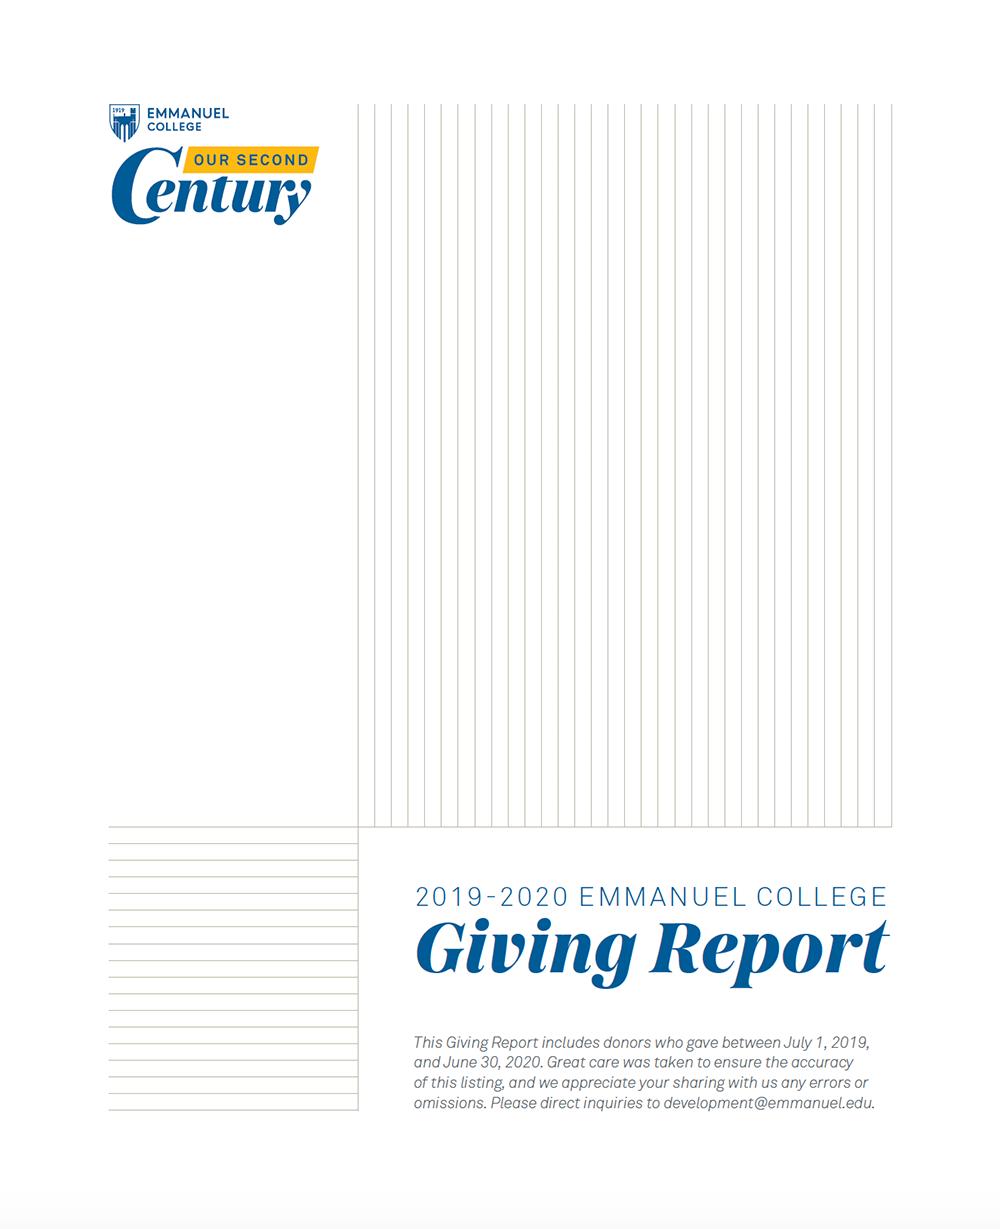 2019-20 Emmanuel College Giving Report